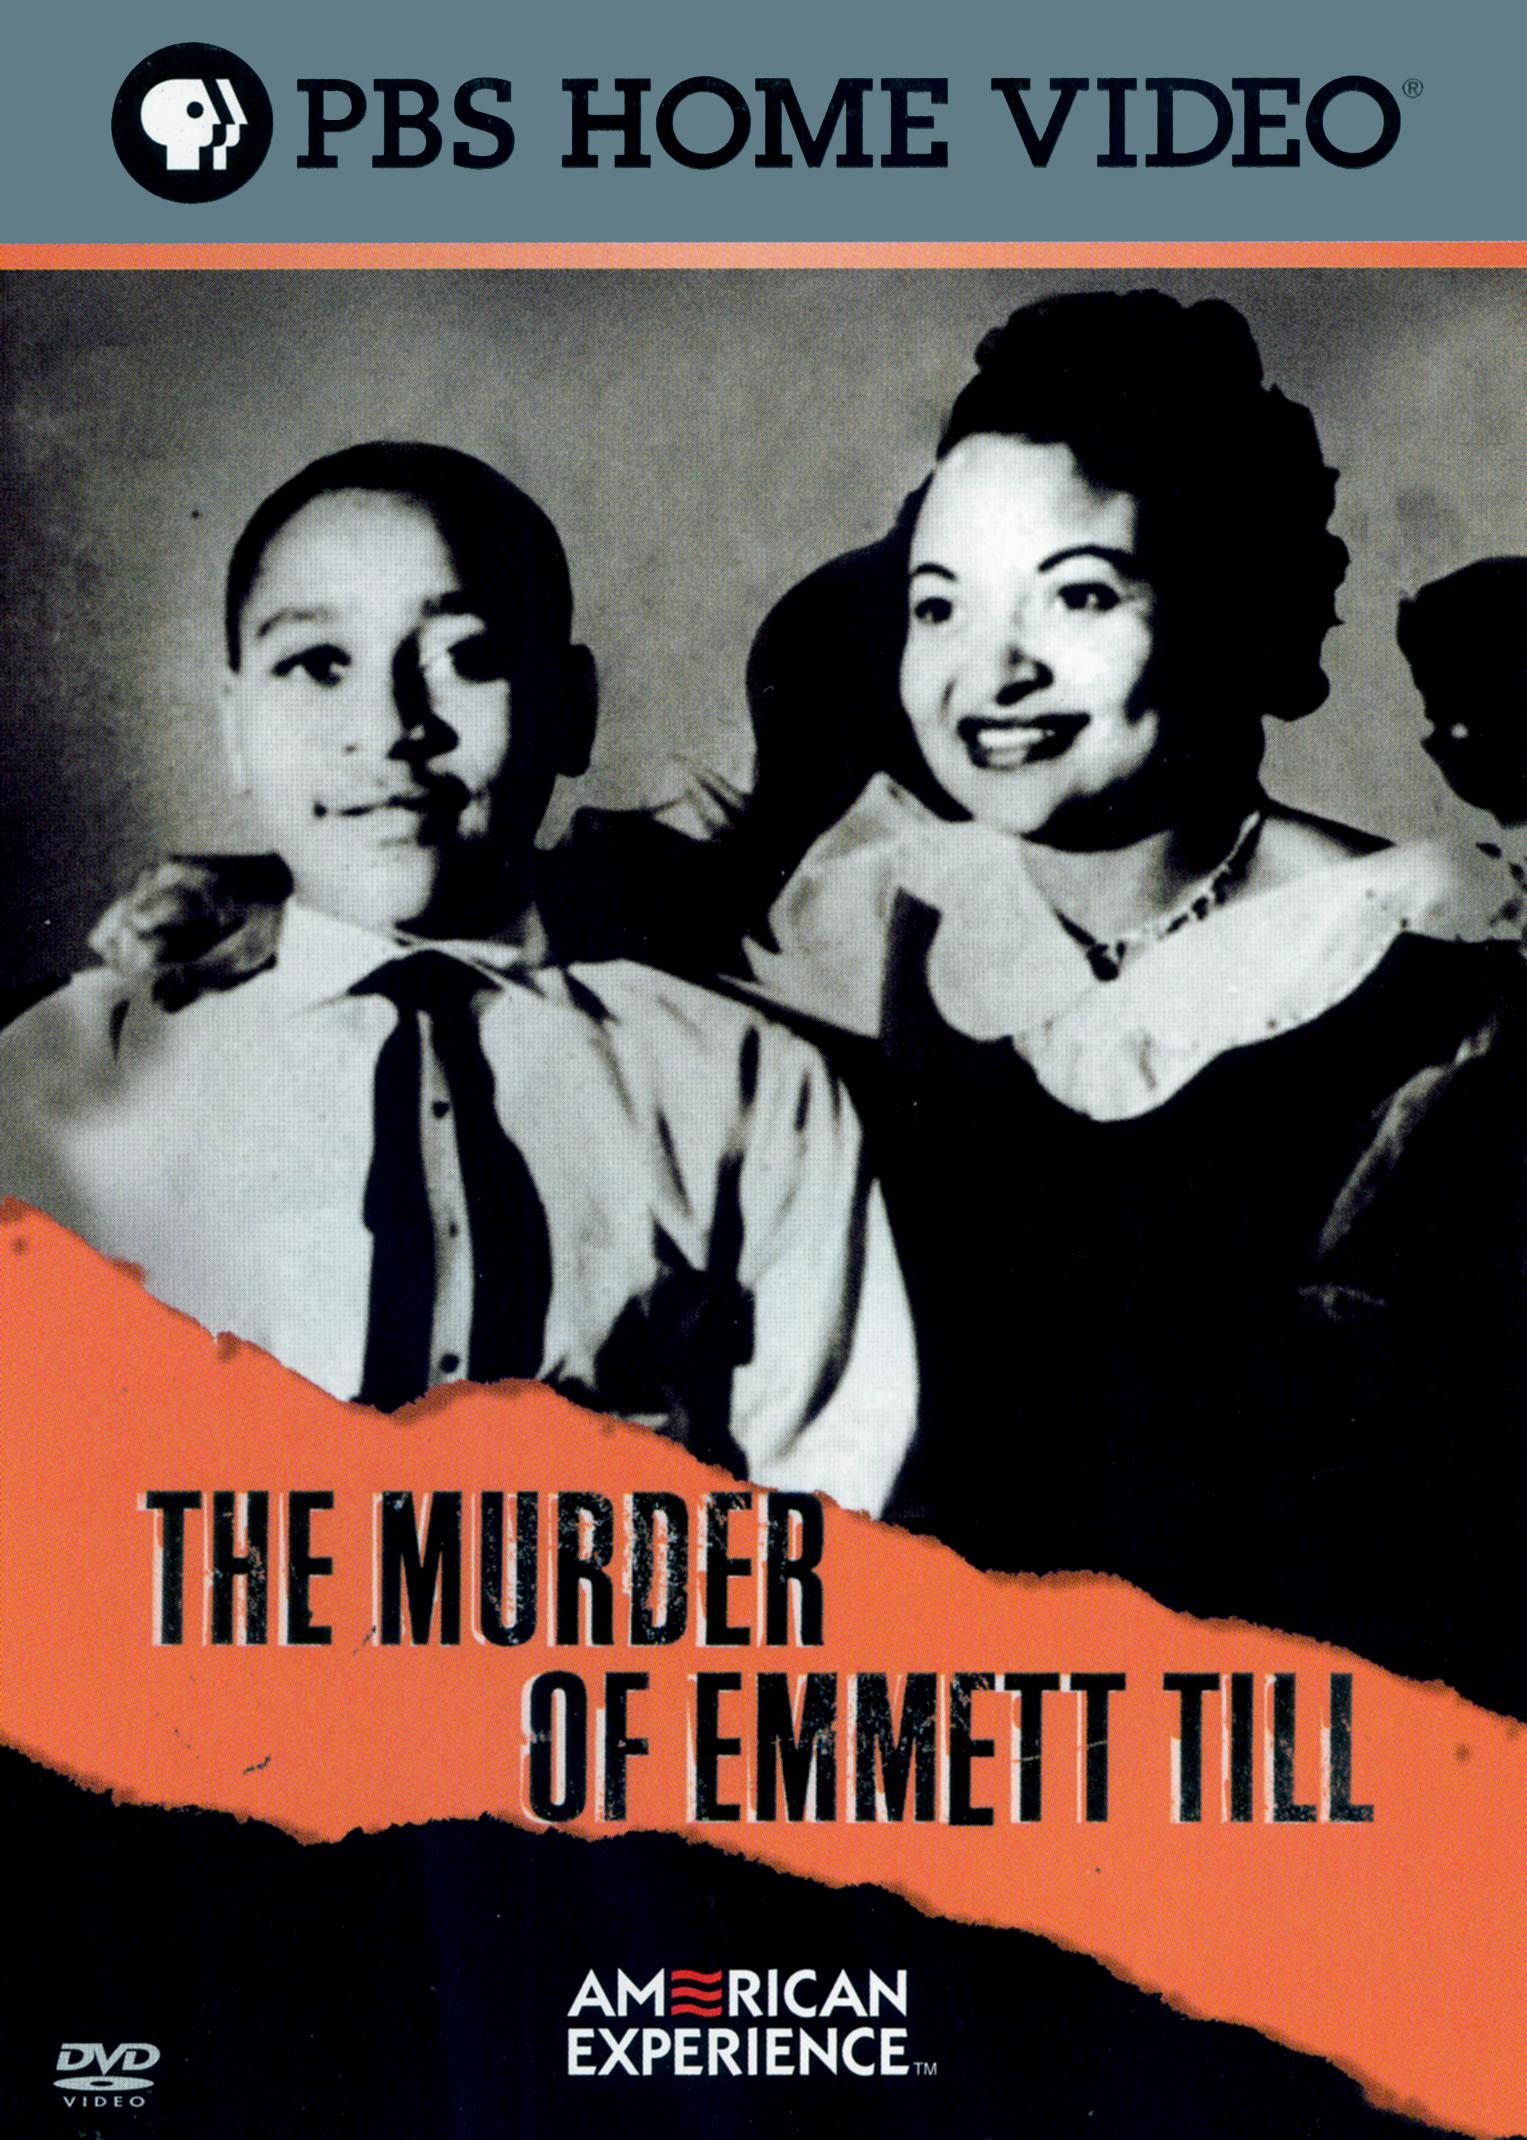 American Experience: The Murder of Emmett Till